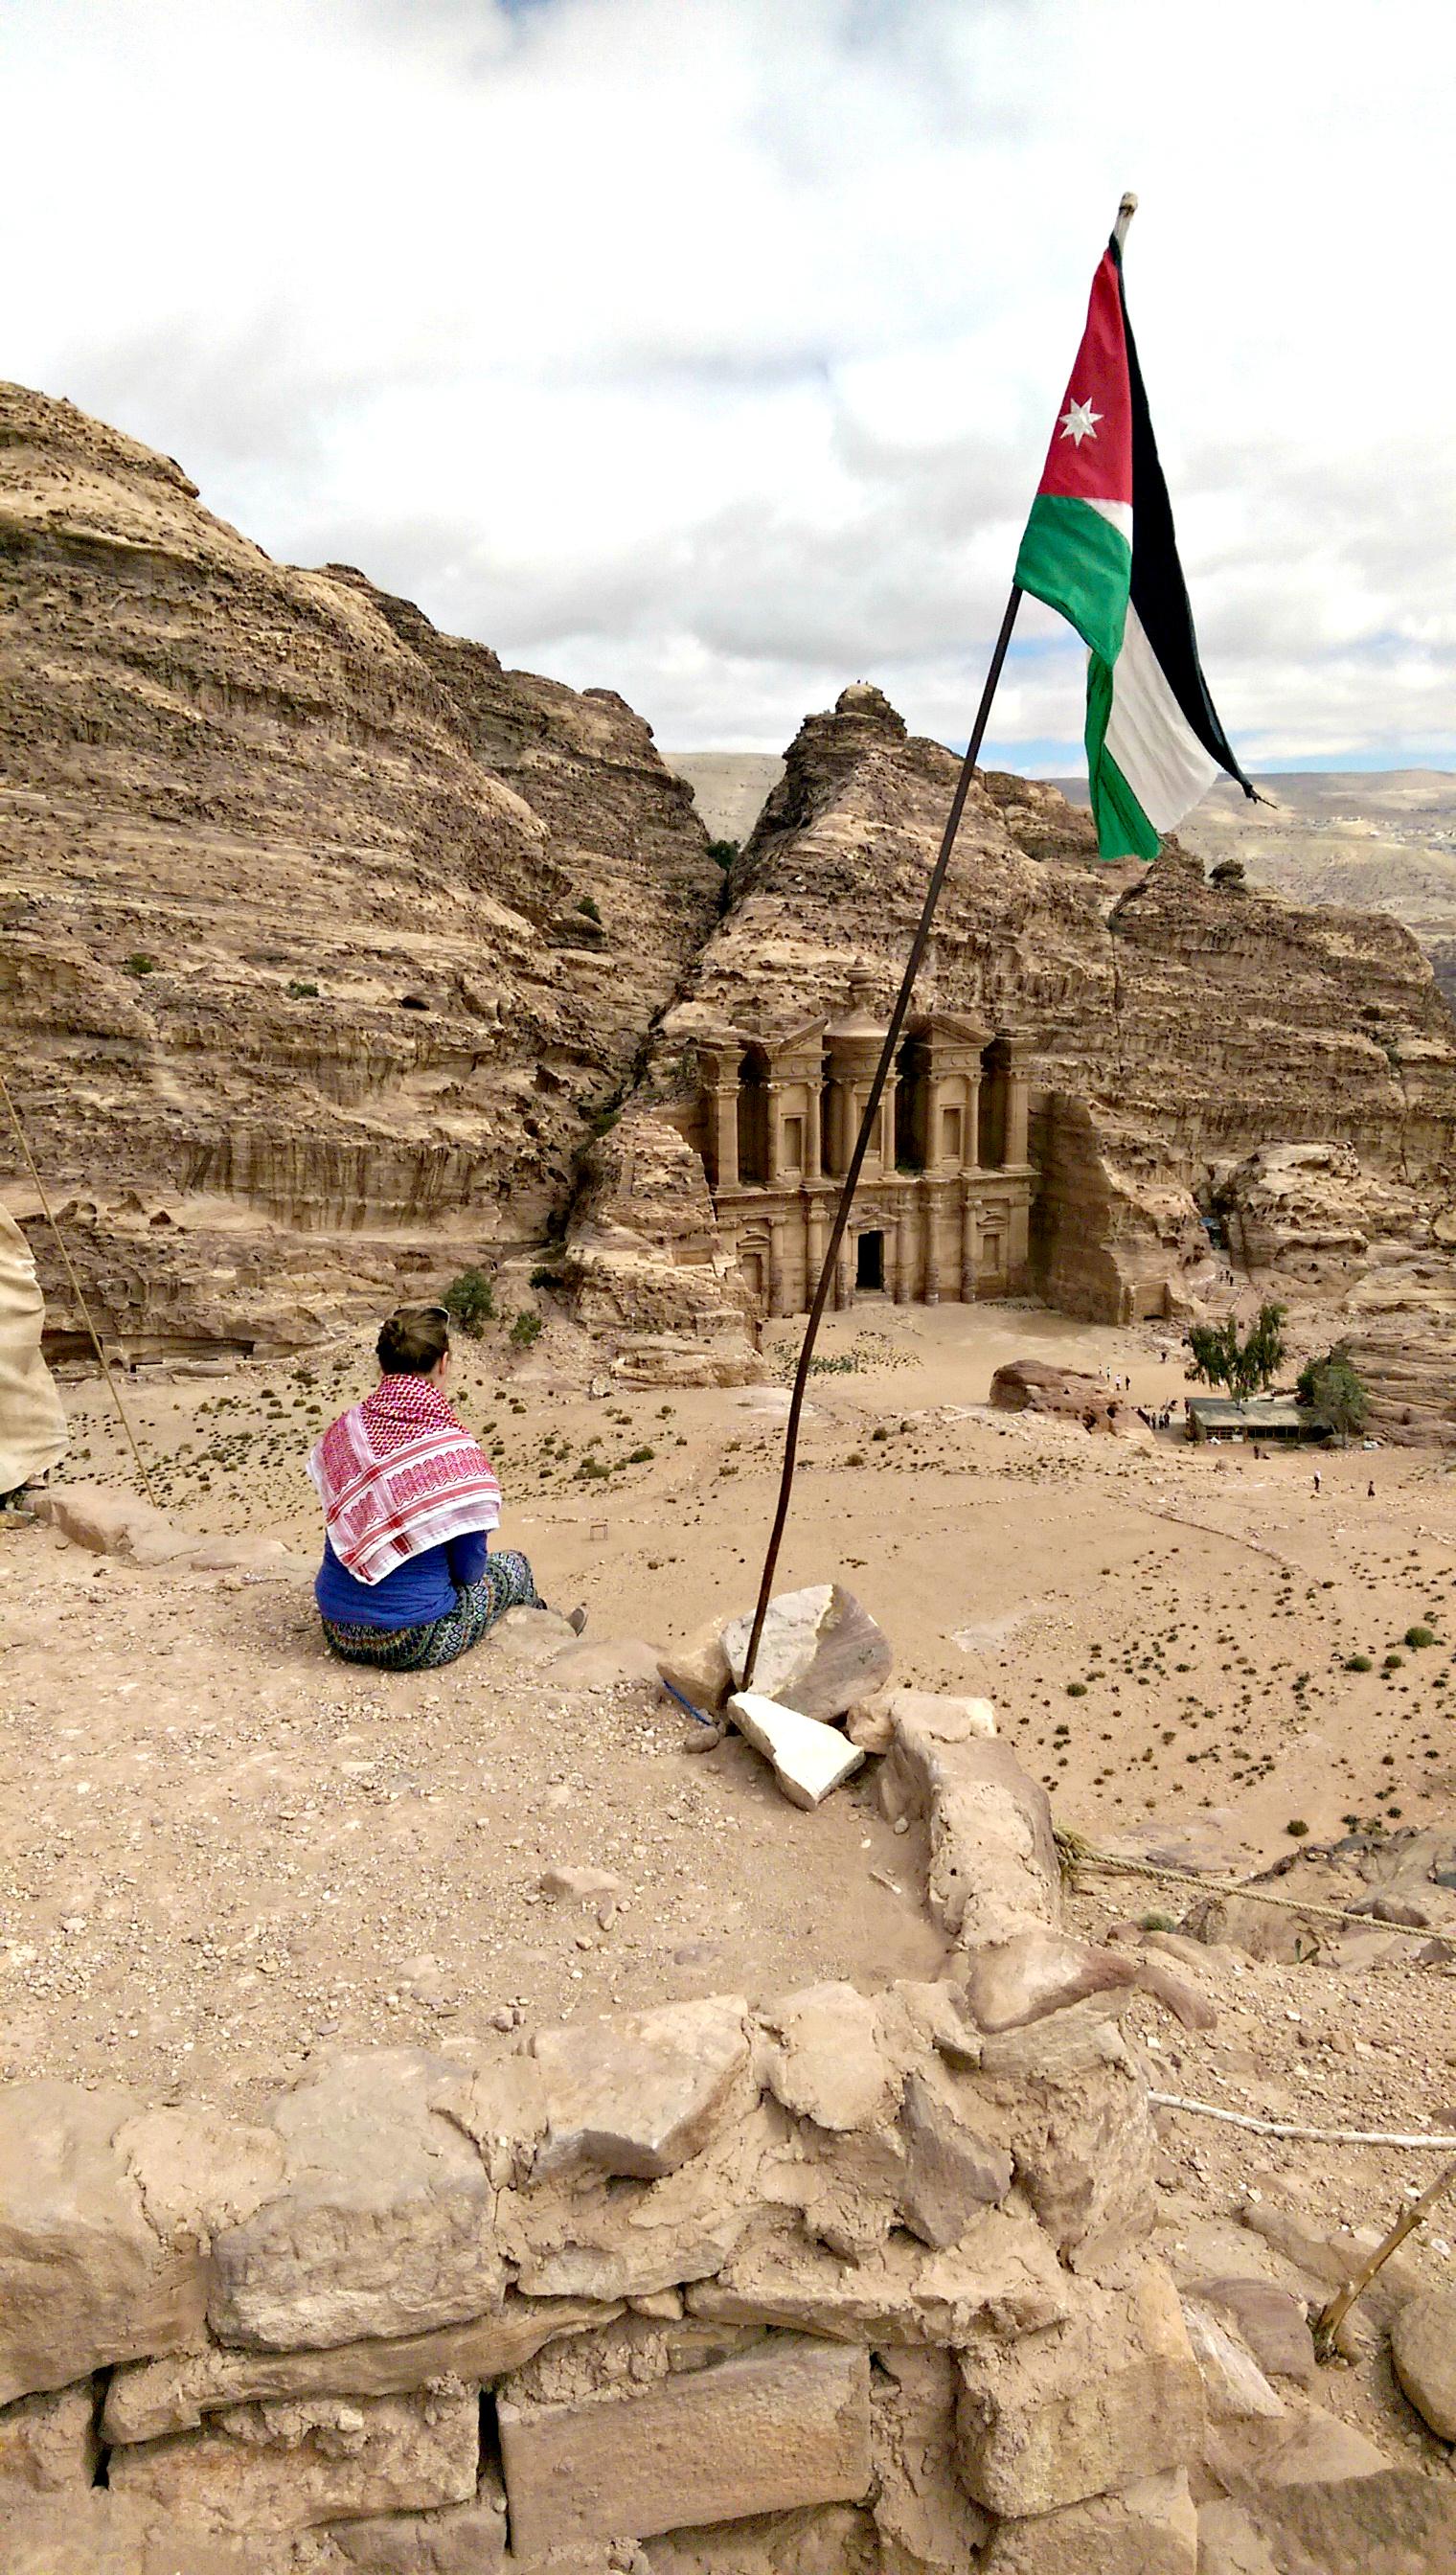 Jordan_Petra_Corinna Goodman_Absorbing Jordan's History at World Wonder Petra